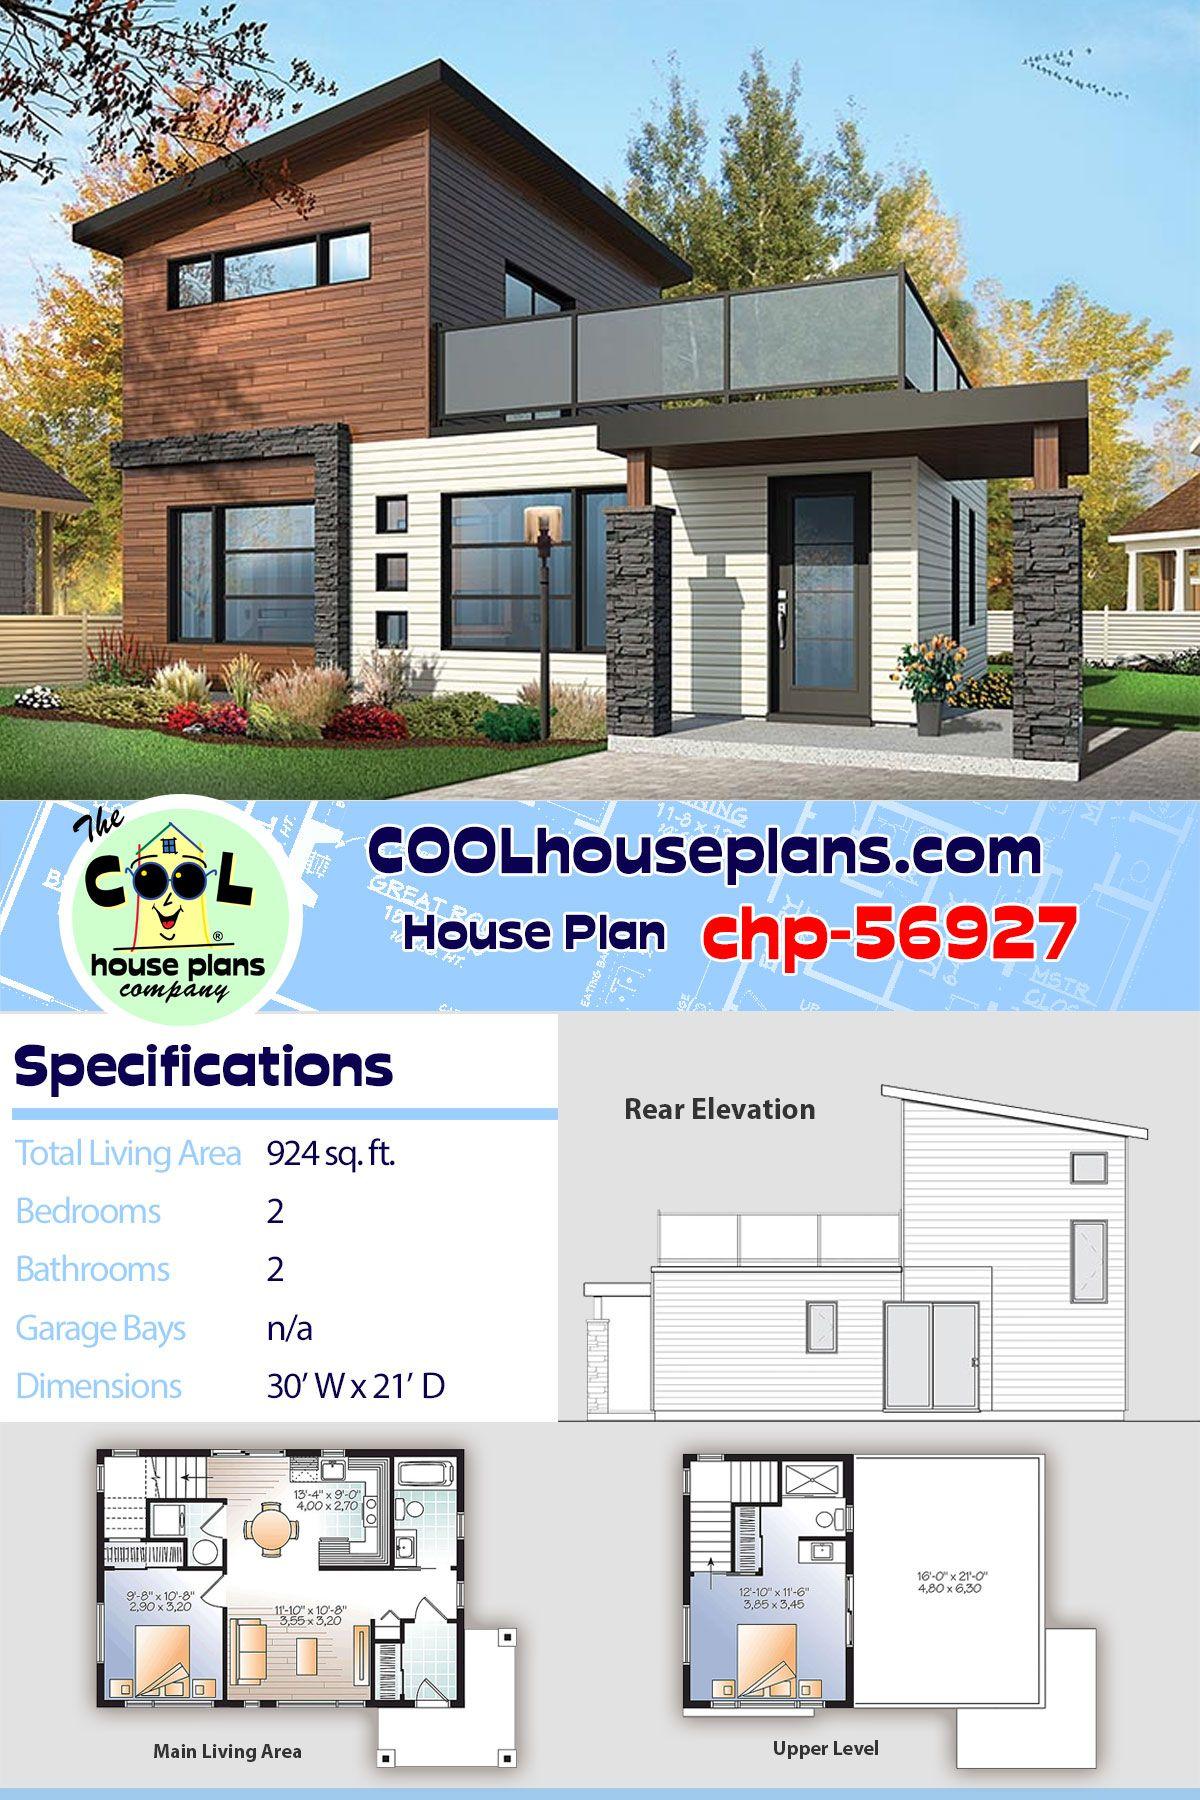 Modern Contemporary Home Plan Chp 56927 Small Floor Plan Under 1000 Sq Ft 2 Be Modern Contemporary House Plans Craftsman House Plans Contemporary House Plans